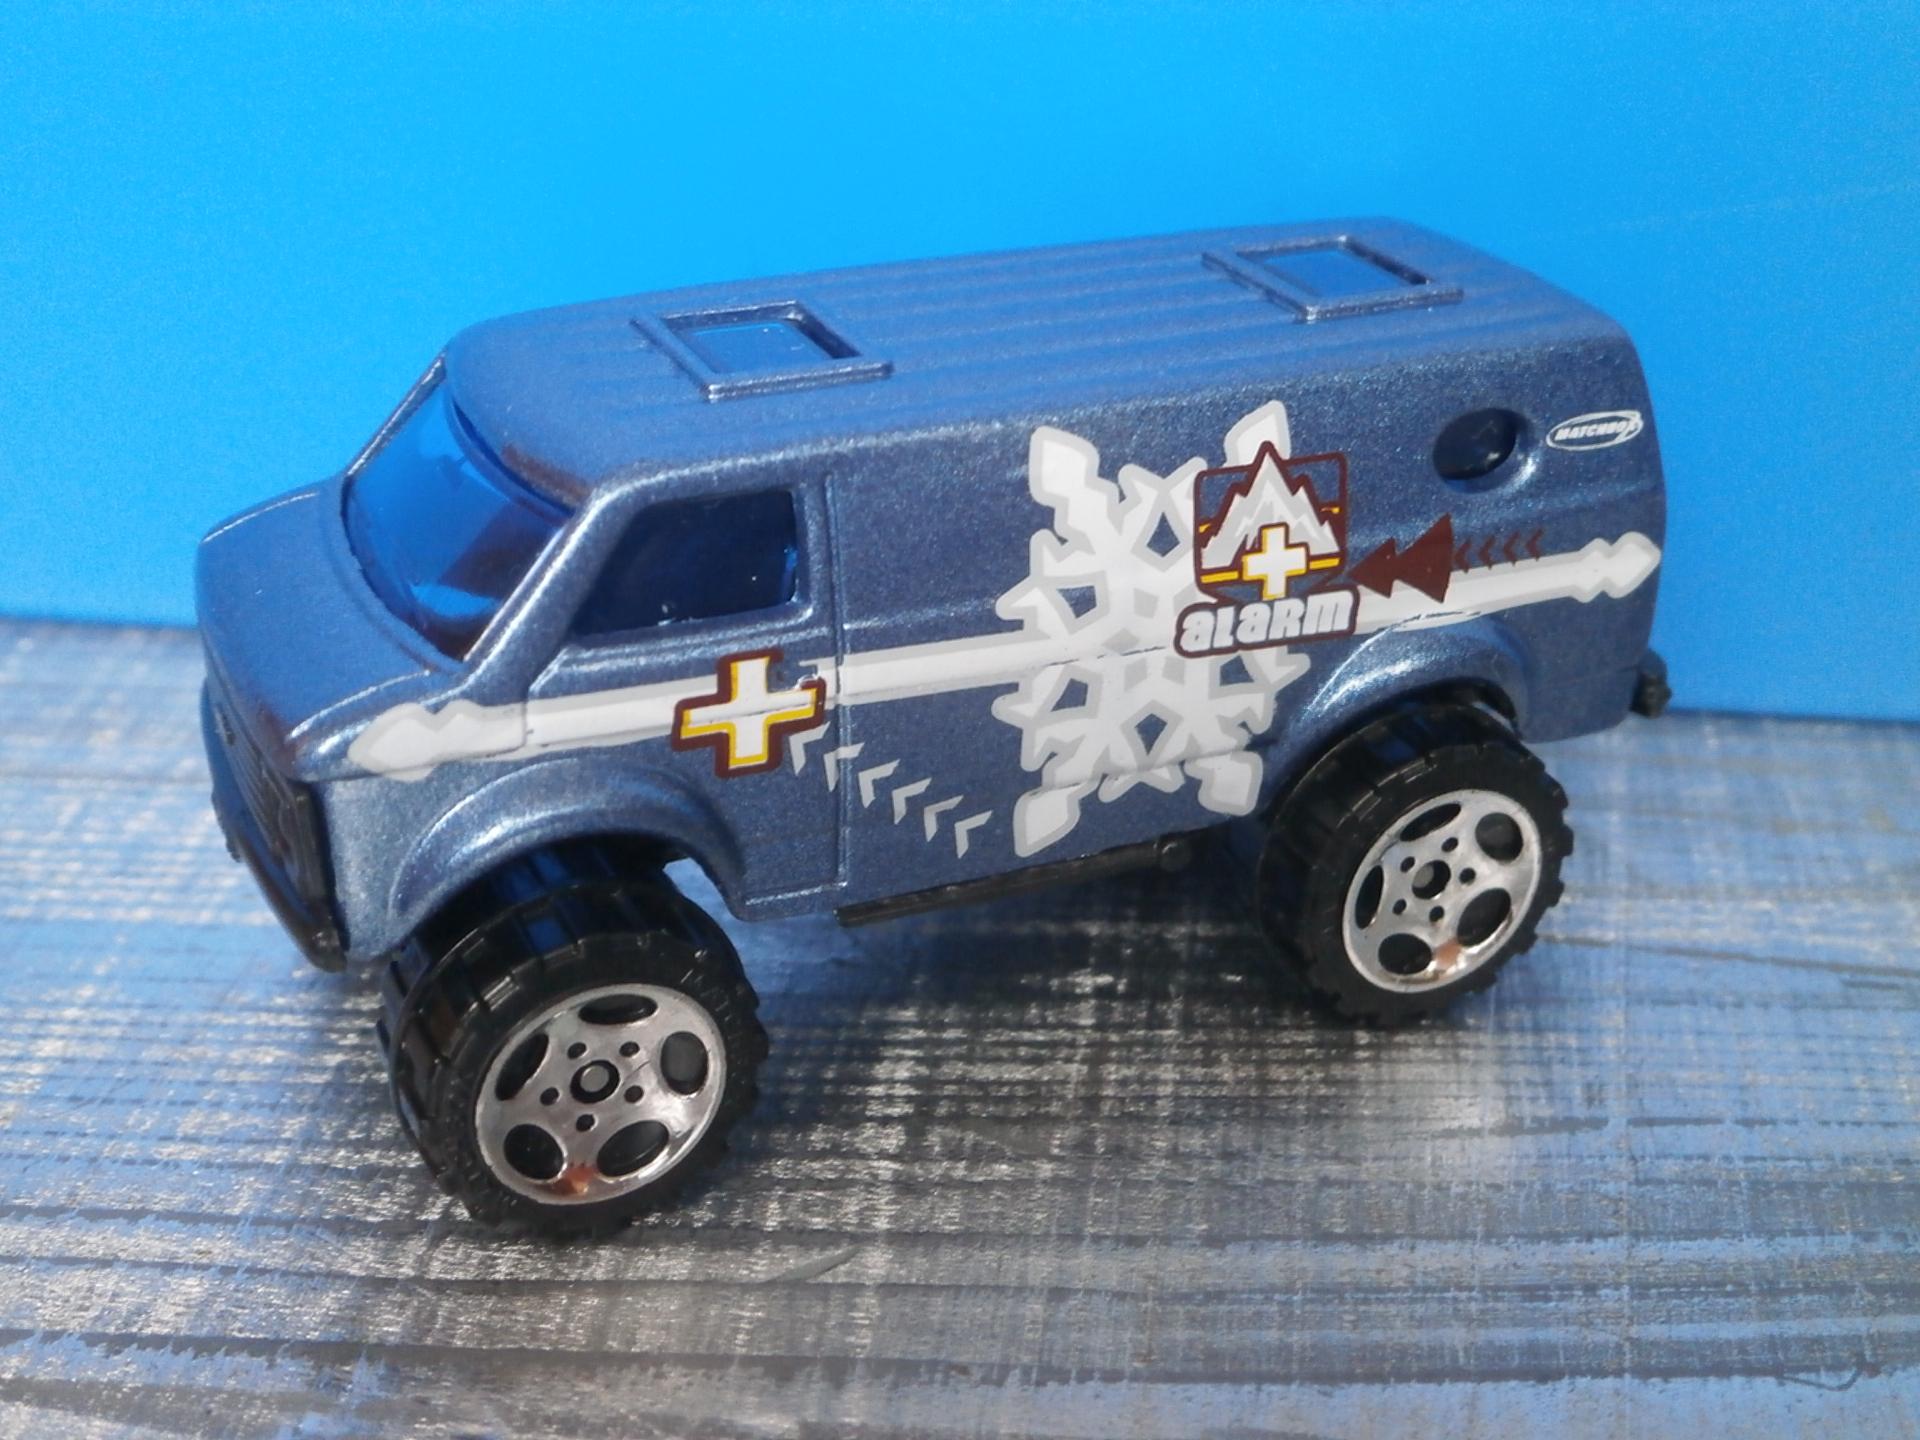 4x4 Chevy Van Matchbox Cars Wiki